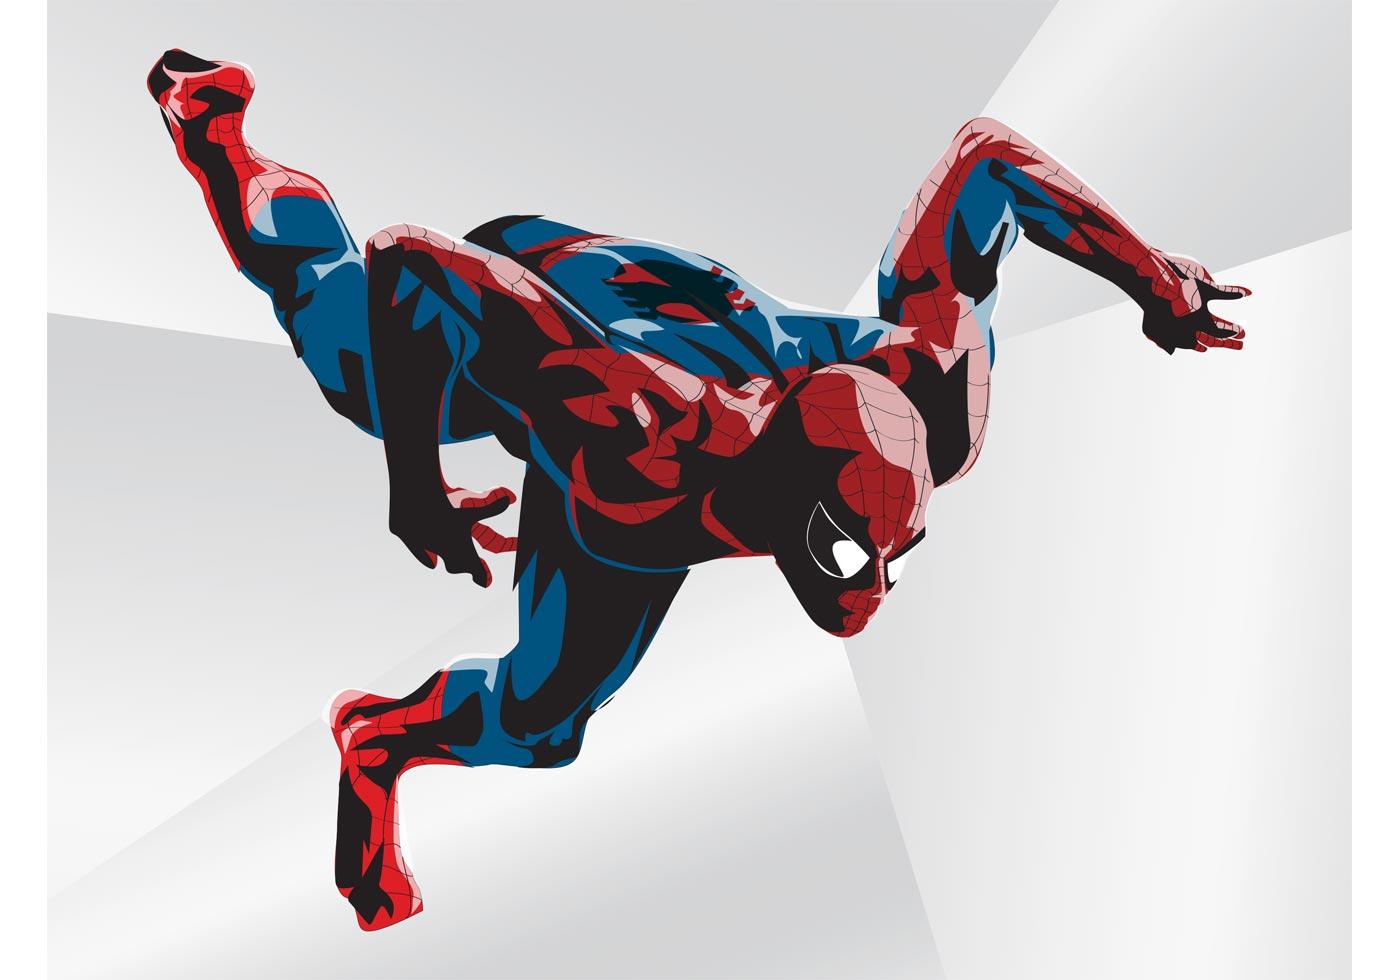 Power Pop Girl Wallpaper Spider Man Download Free Vector Art Stock Graphics Amp Images